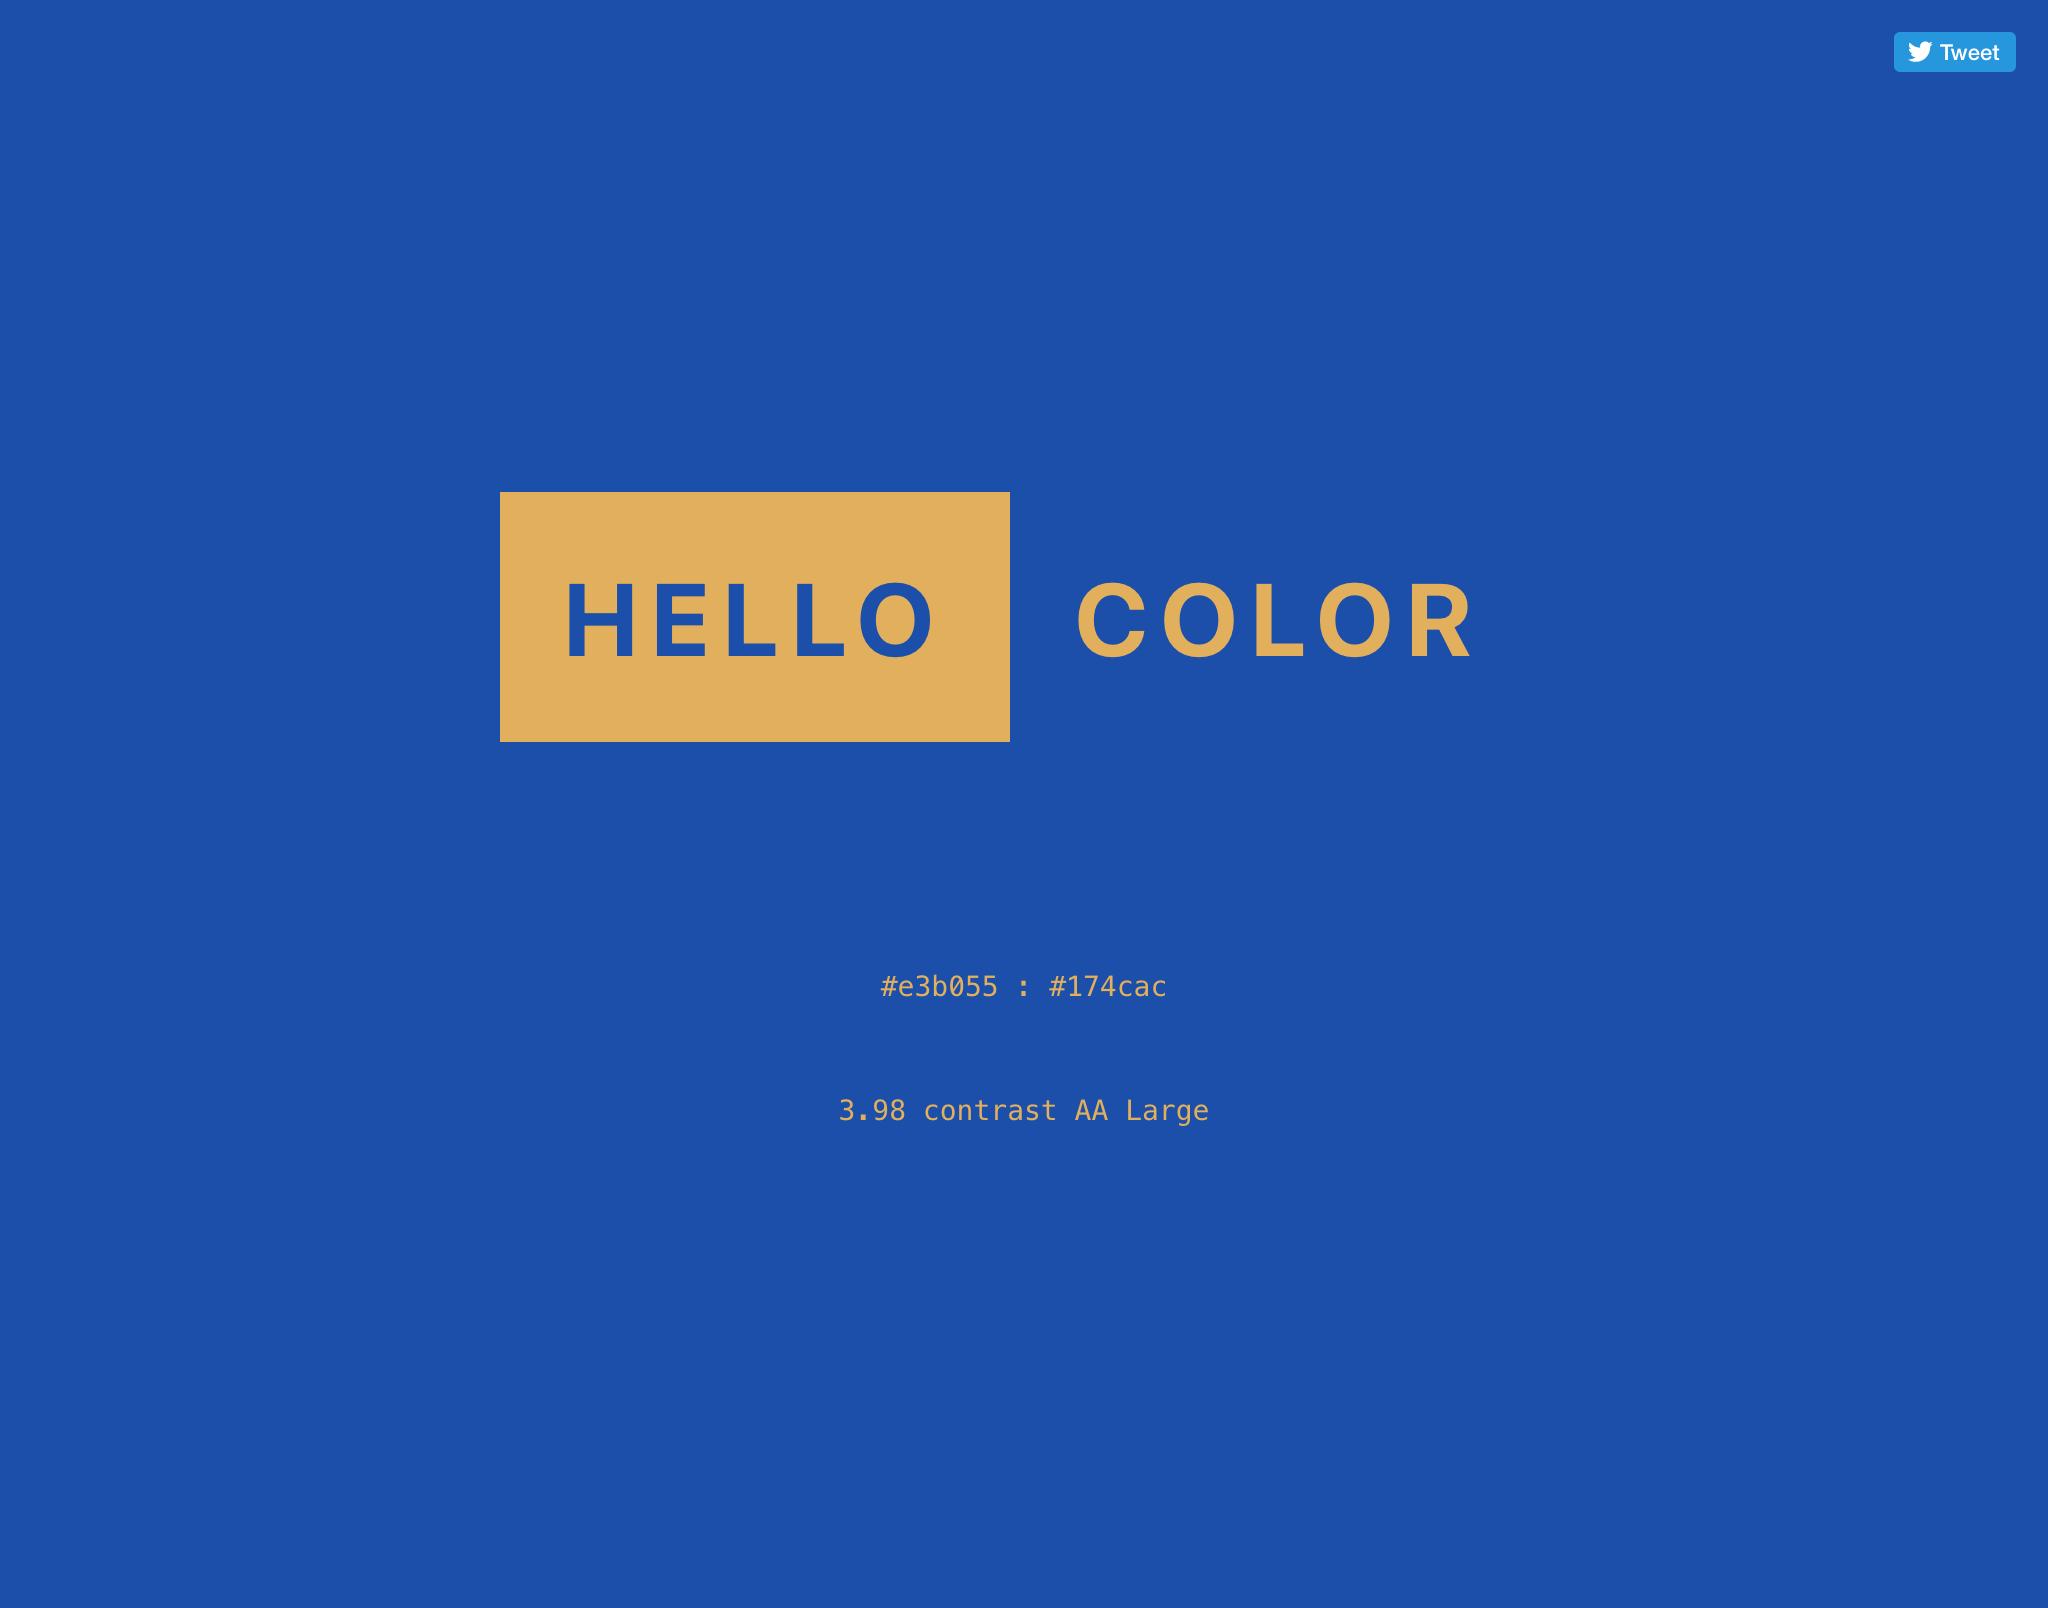 jxnblk.com_hello-color__c=174cac